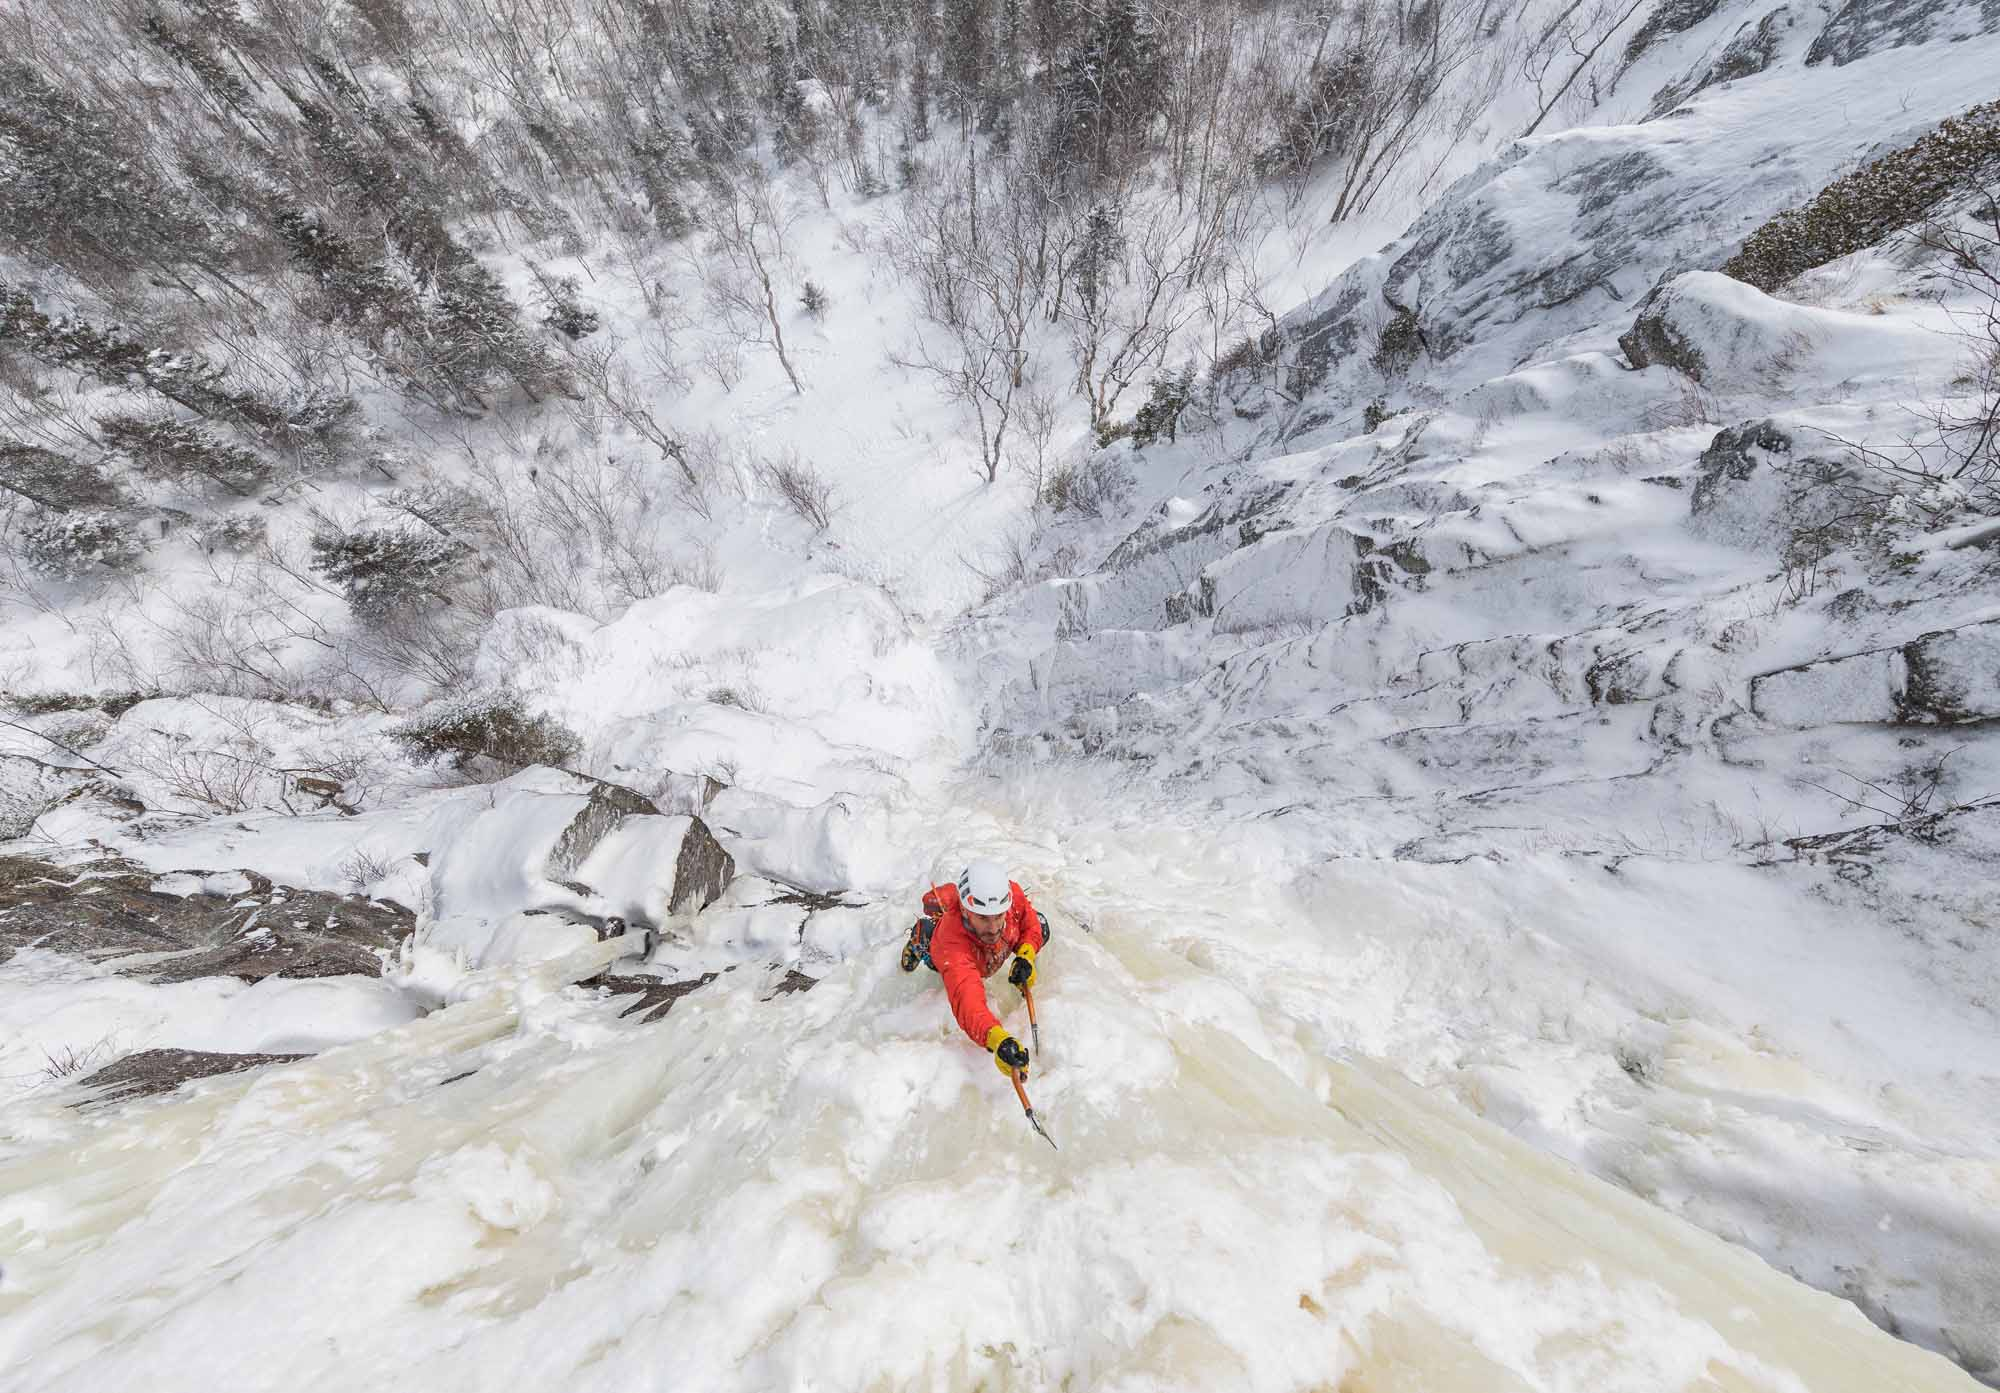 Quebec-Winter-showcase-Jeff-Mercier-climbing-Fjord-du-Saguenay-National-Park-photo-by-TIM-BANFIELD